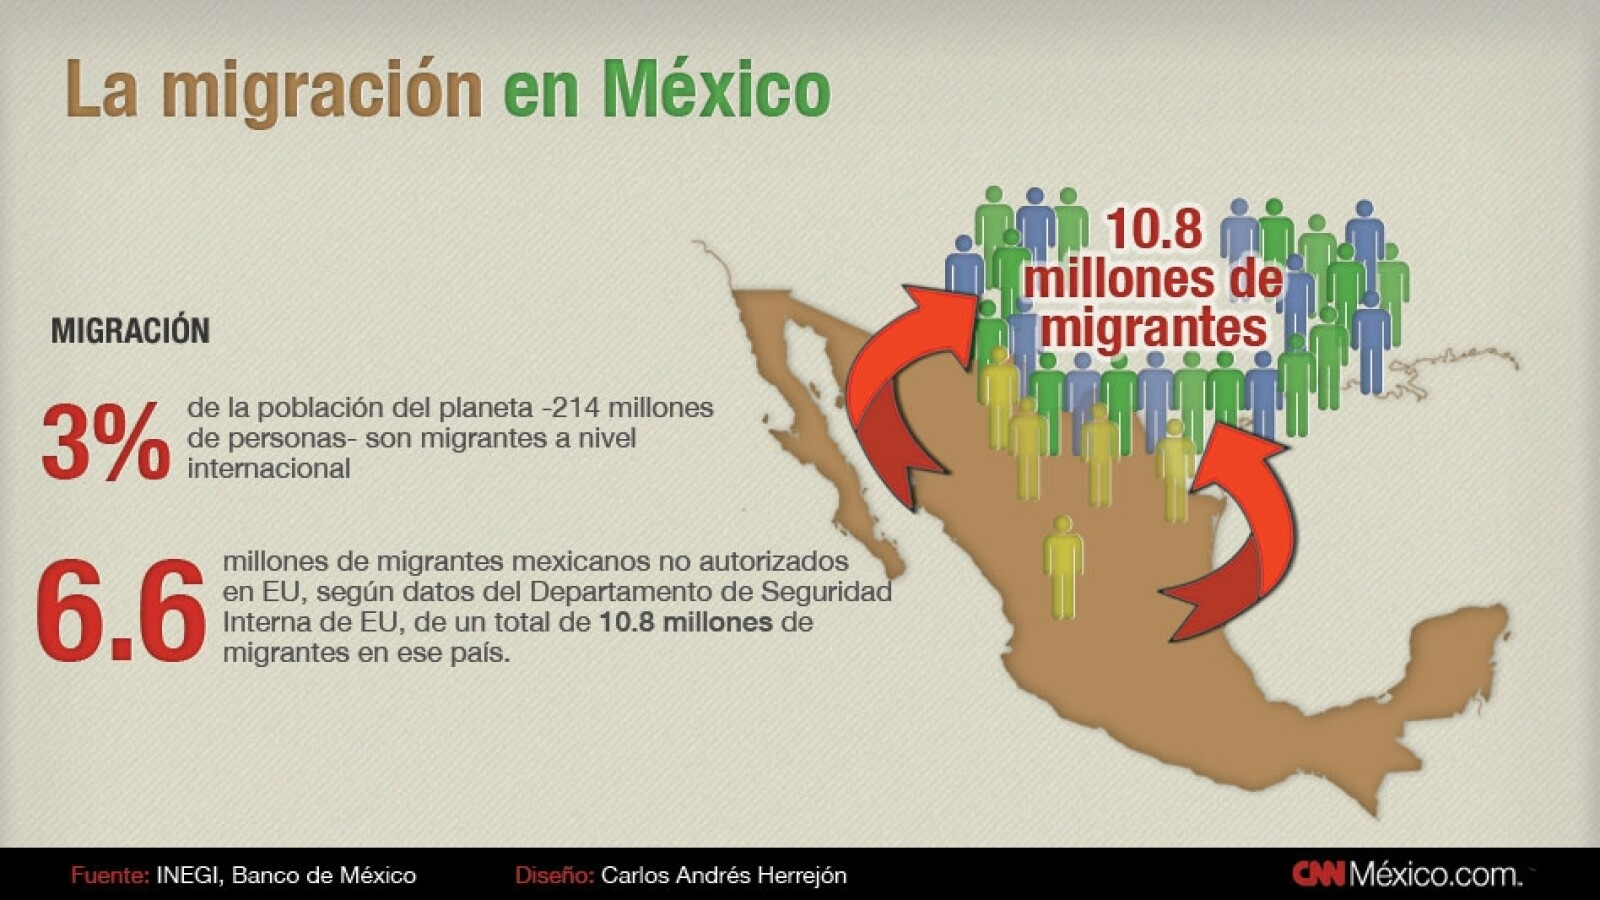 migracion mexico 1 ok